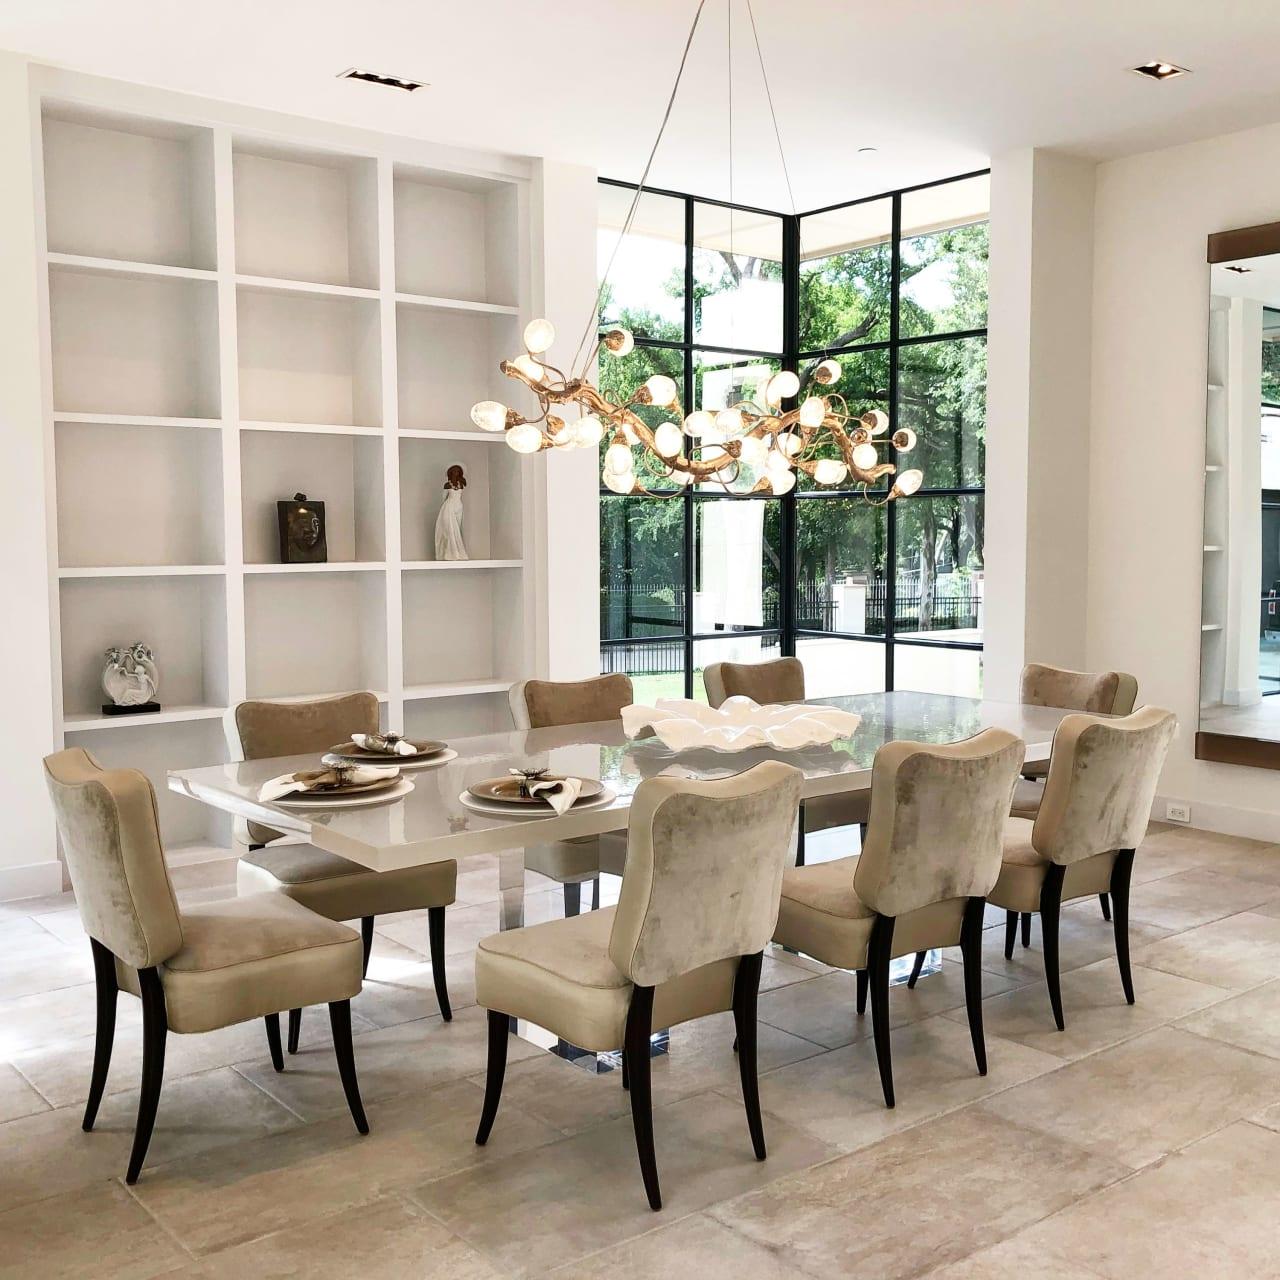 Dining Room image 1